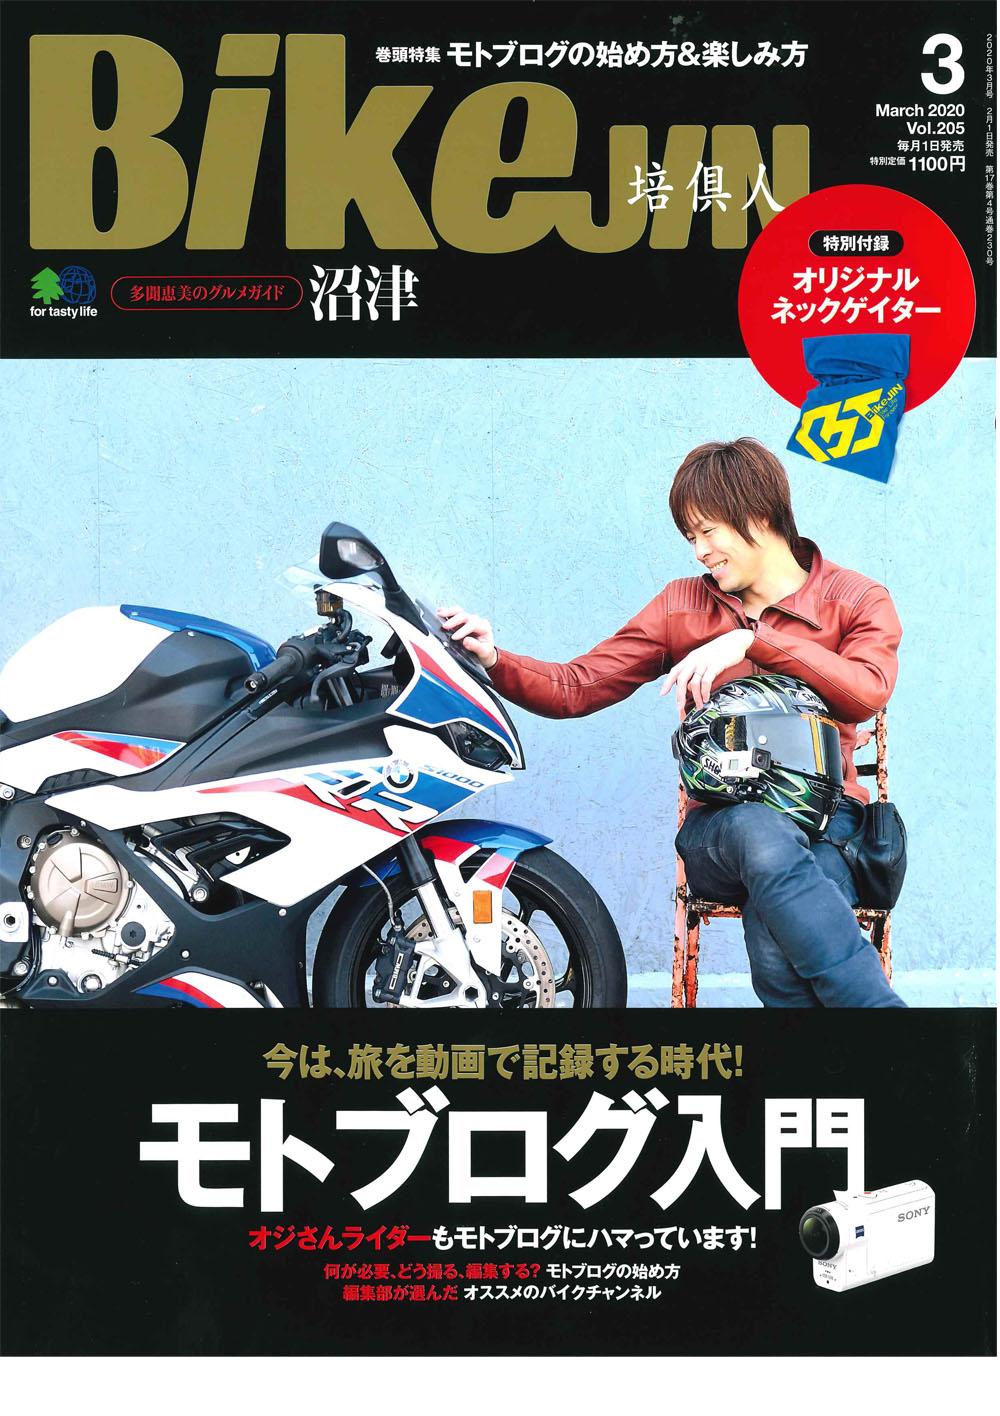 【BikeJIN 3月号掲載】 新商品『B+COM ONE』プレミアムスタンダード